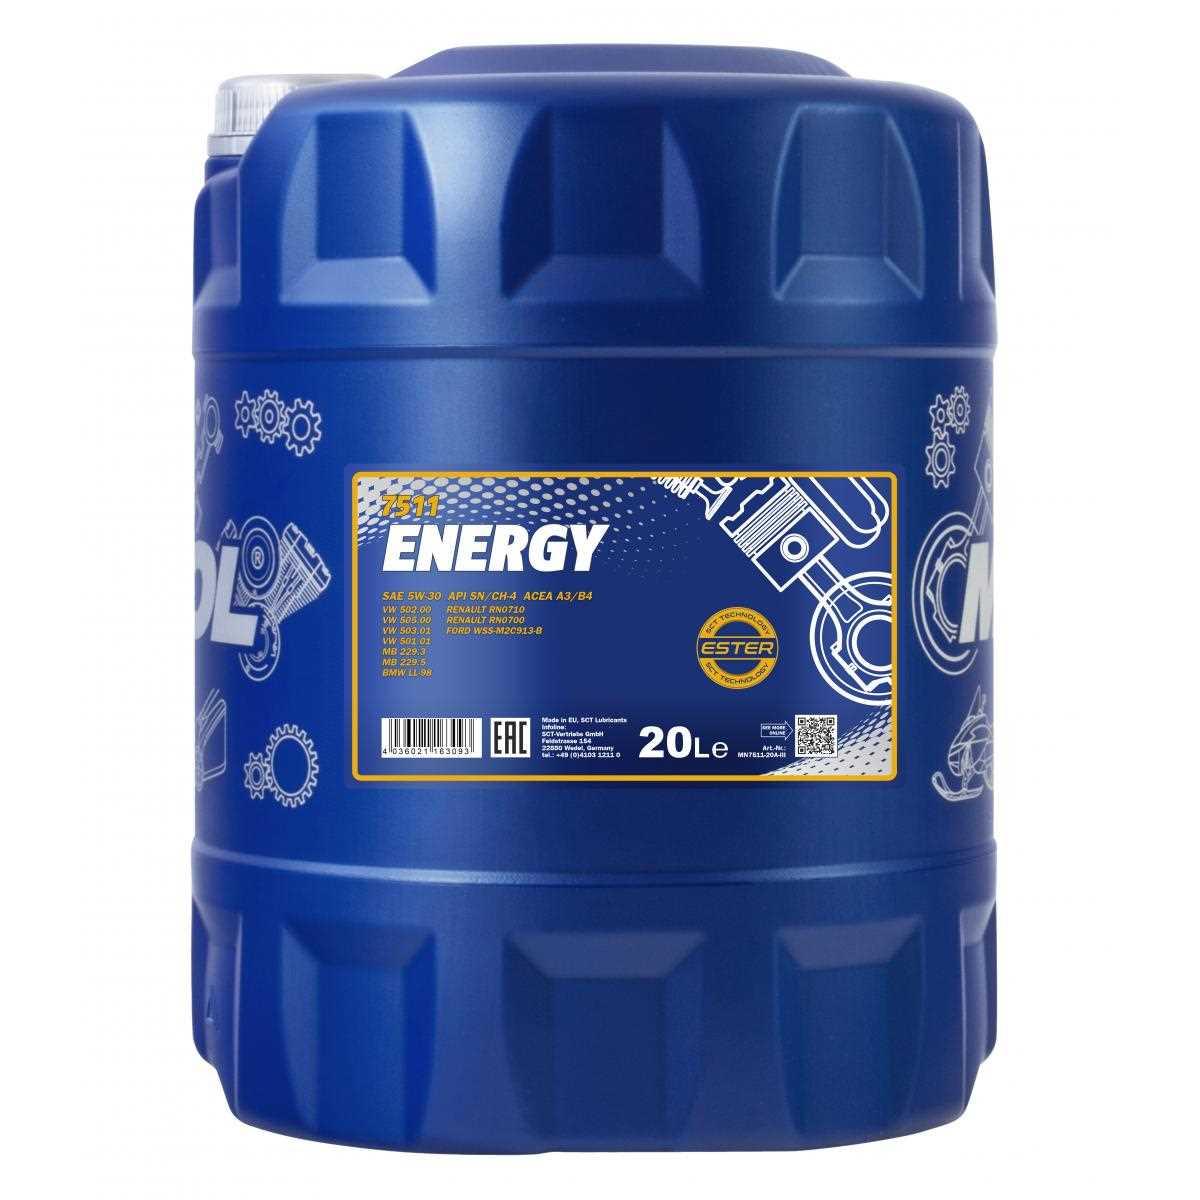 Aceite-del-motor-aceite-5w40-10w40-15w40-5w30-10w60-1l-4l-5l-7l-10l-20l miniatura 34